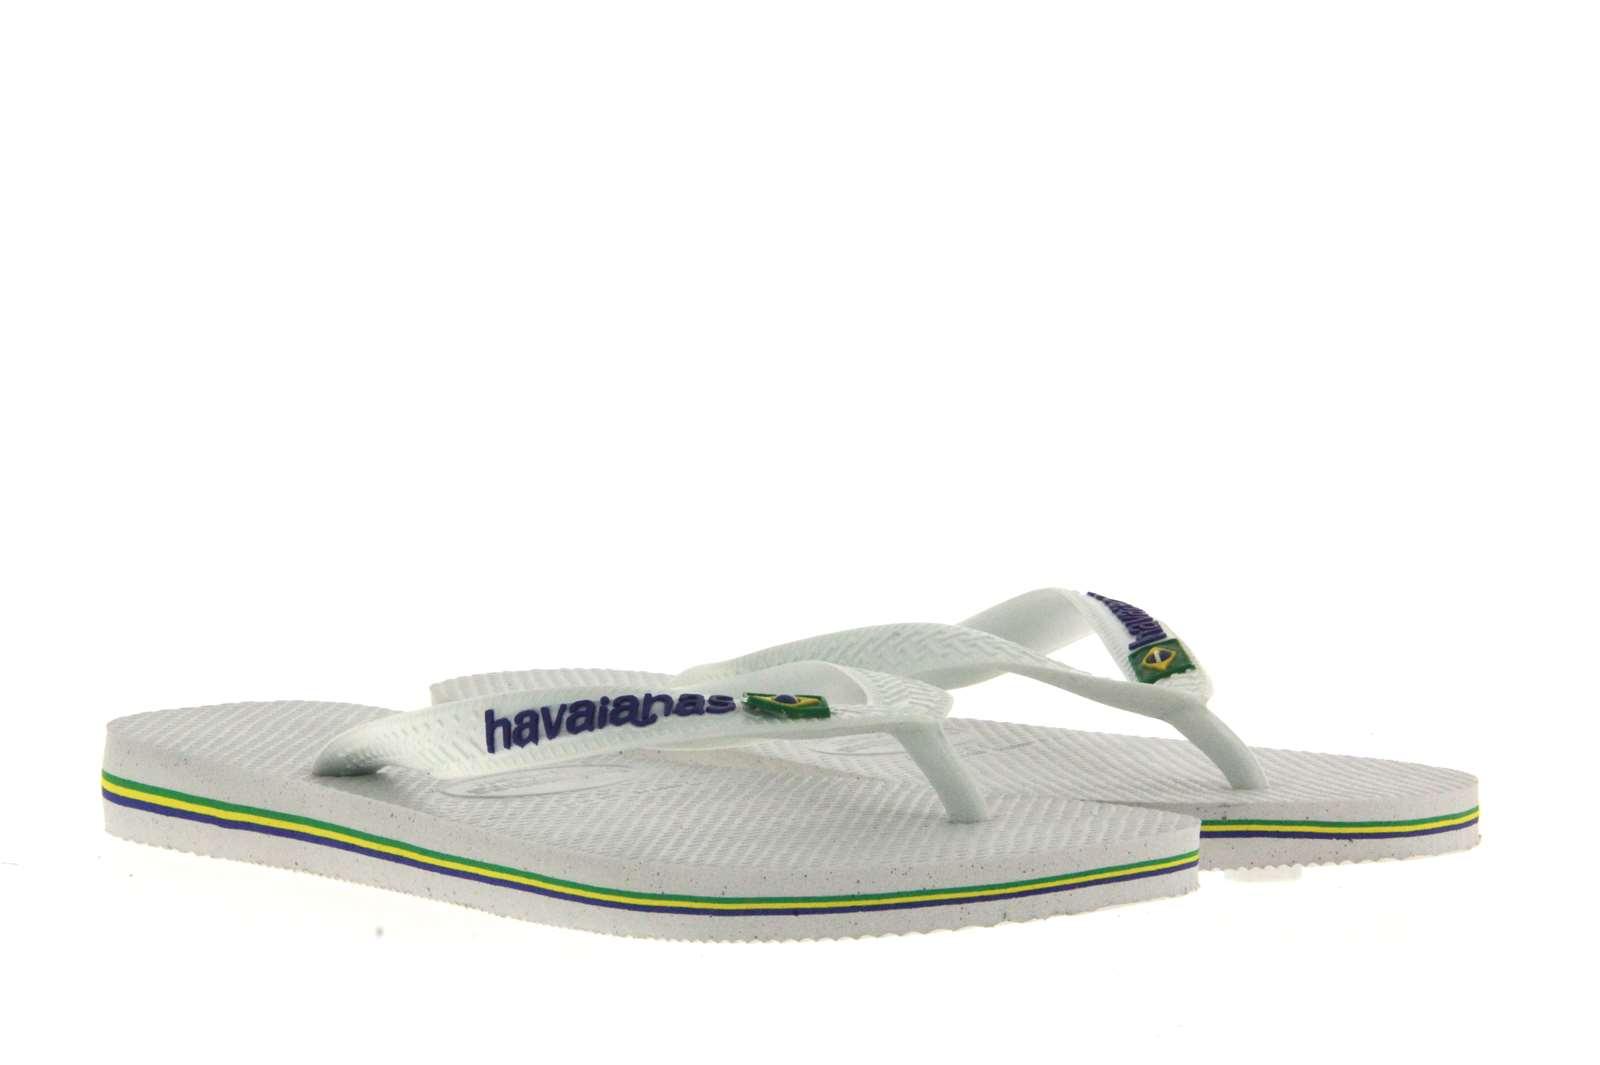 Havaianas toe sandal MEN BRASIL LOGO WHITE